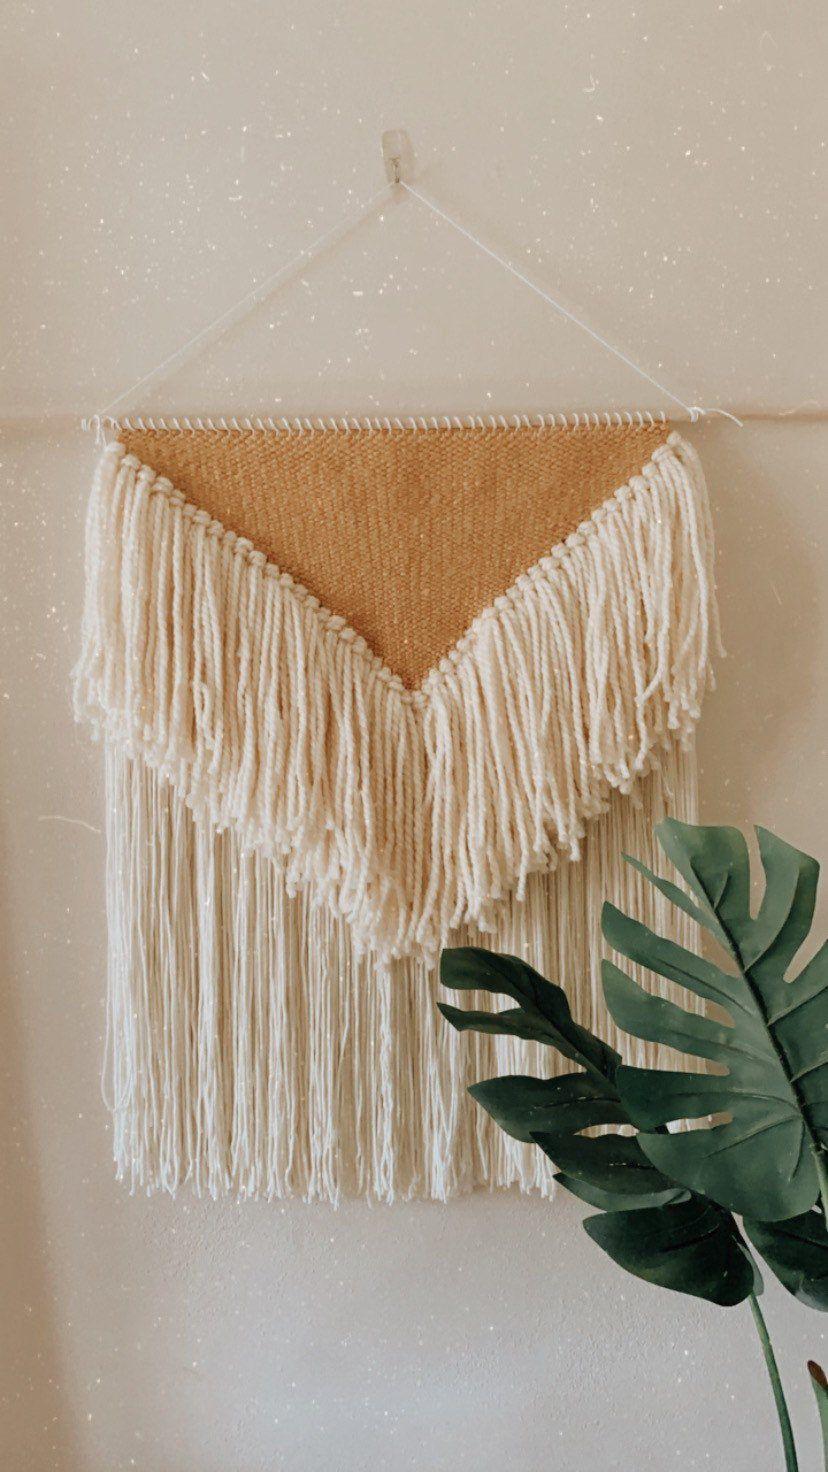 Excited to share this item from my #etsy shop: Large Mustard Fringe Weaving #wovenwallart #boho #bohostyle #bohemian #weaving #woventapestry #modernweaving #weavingwallart #fiberart